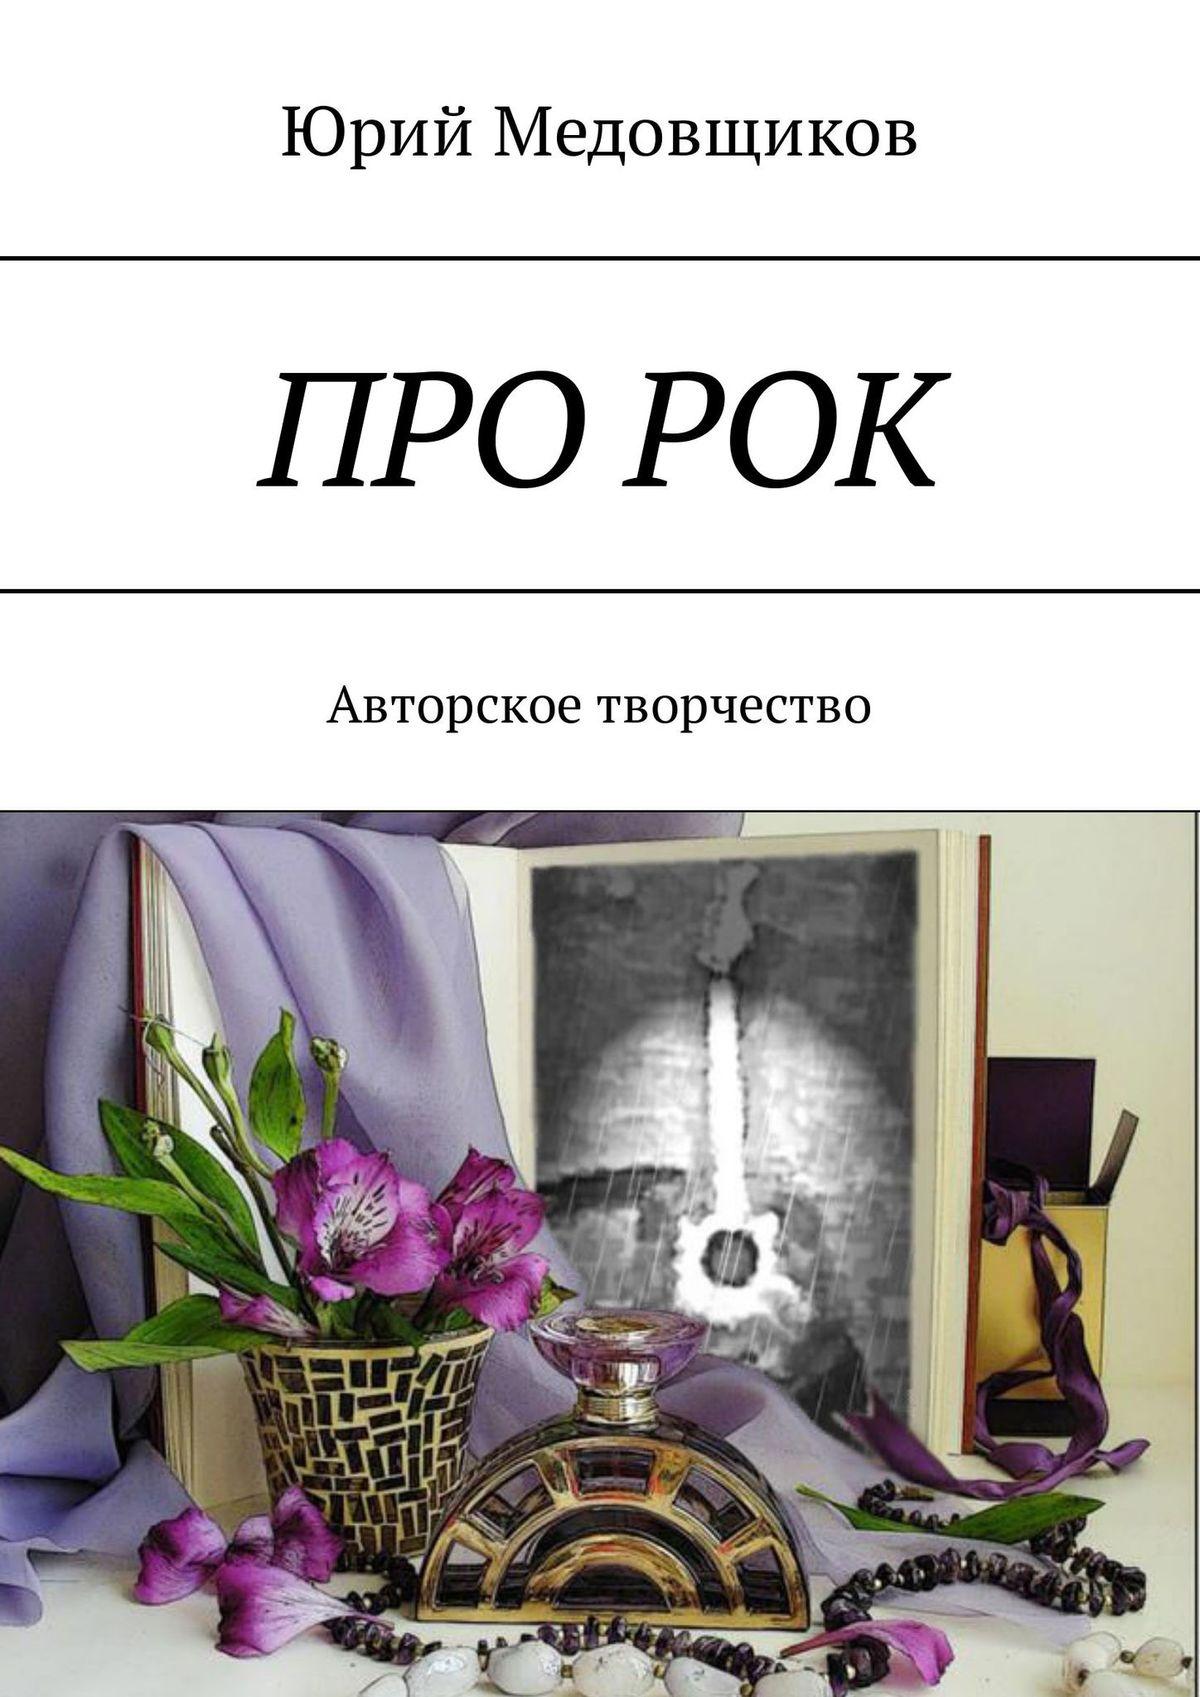 Юрий Медовщиков Про рок. Авторское творчество